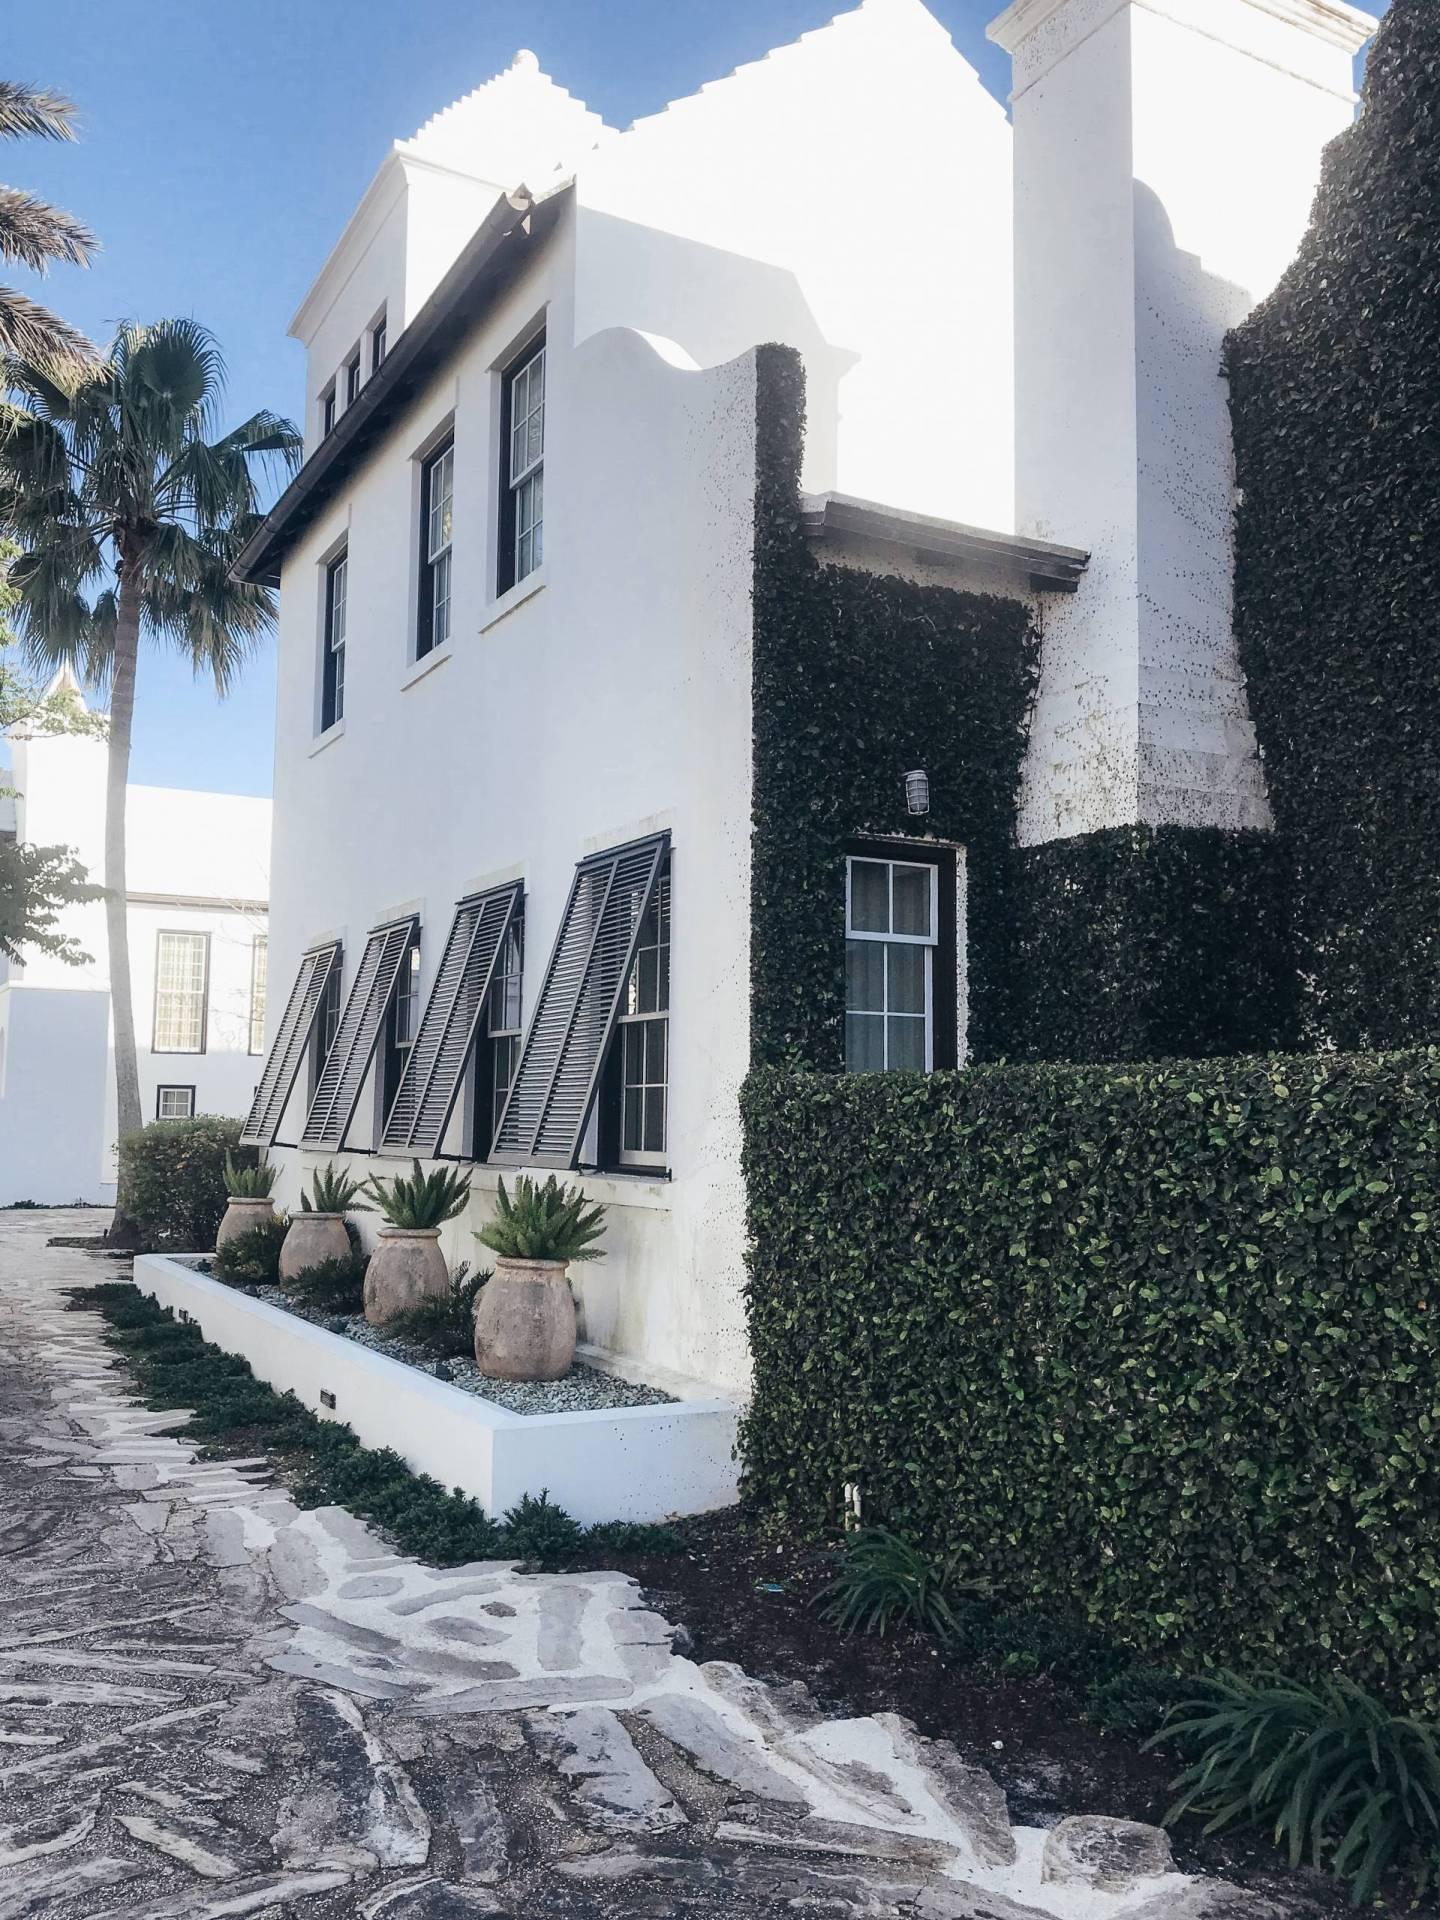 A Guide to Alys Beach 30A, Florida's Hidden Gem